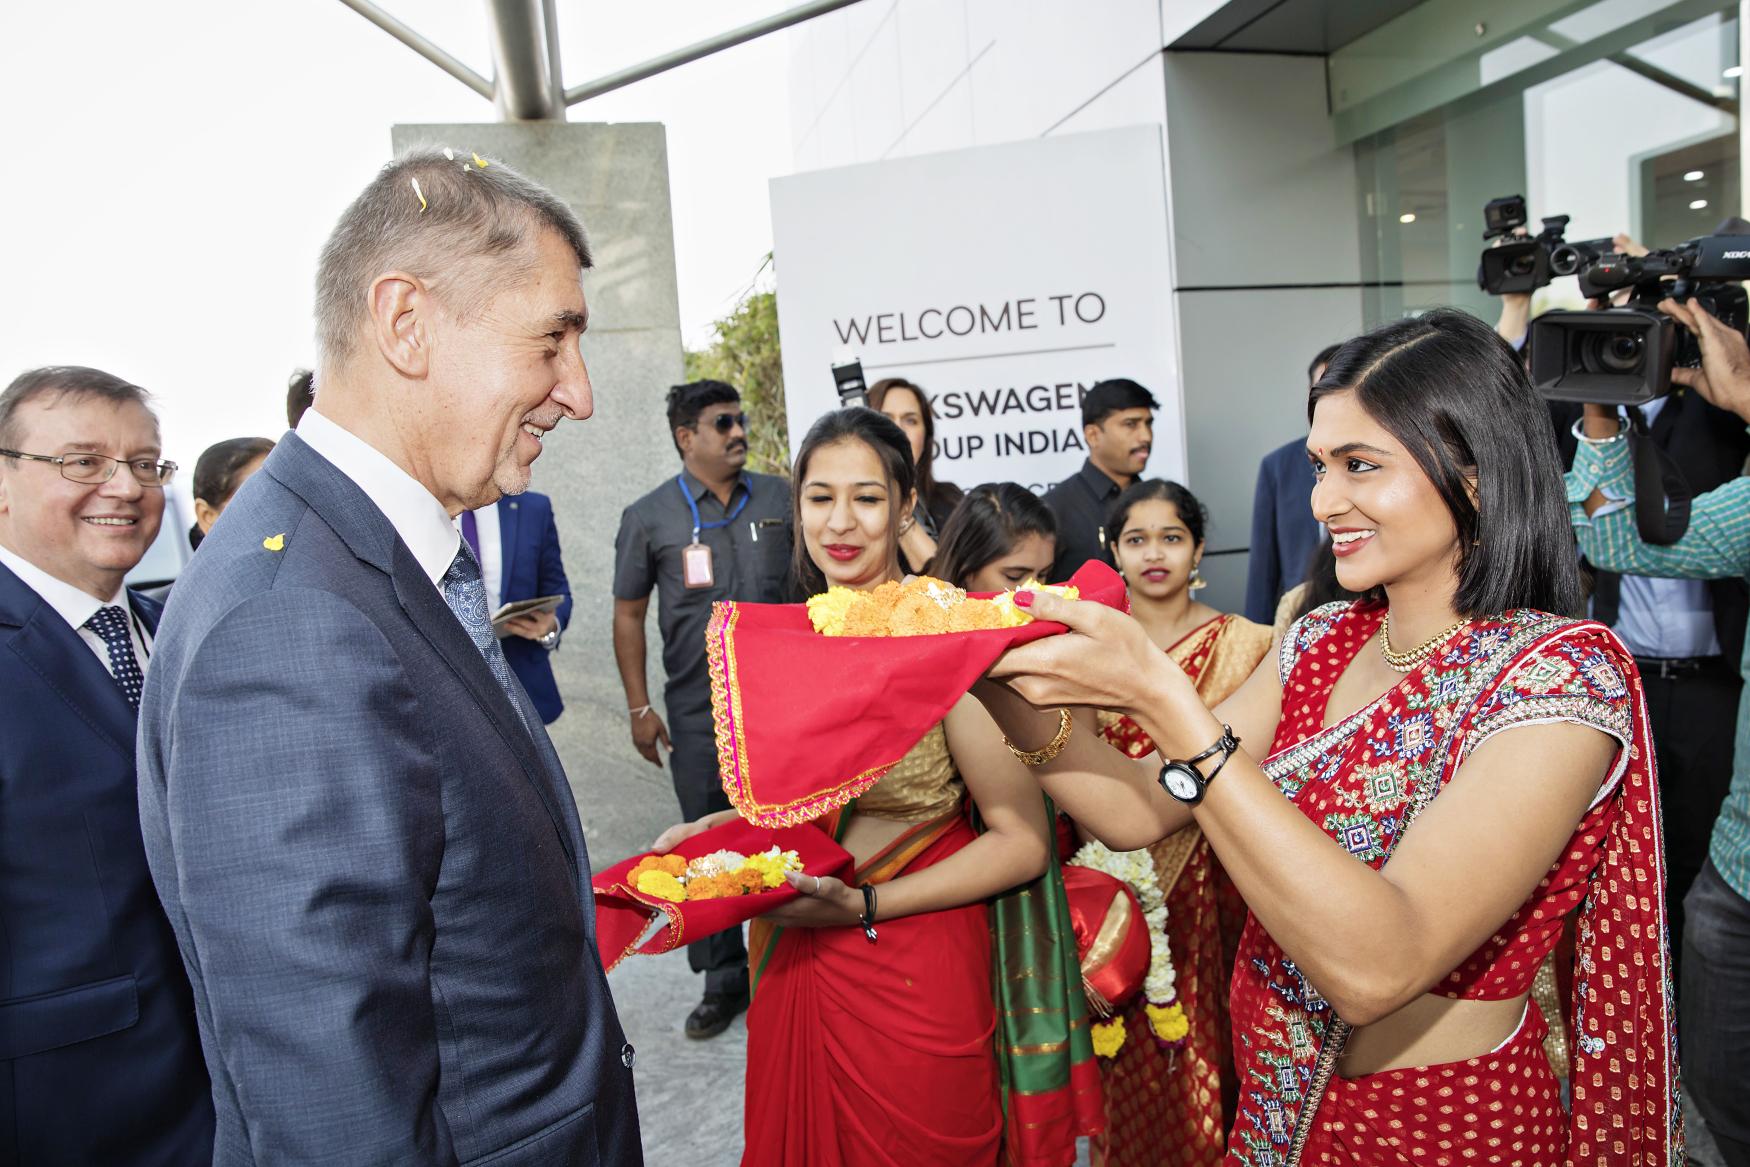 Andrej Babiš in Indien (Foto: ČTK / Martin Štěrba)